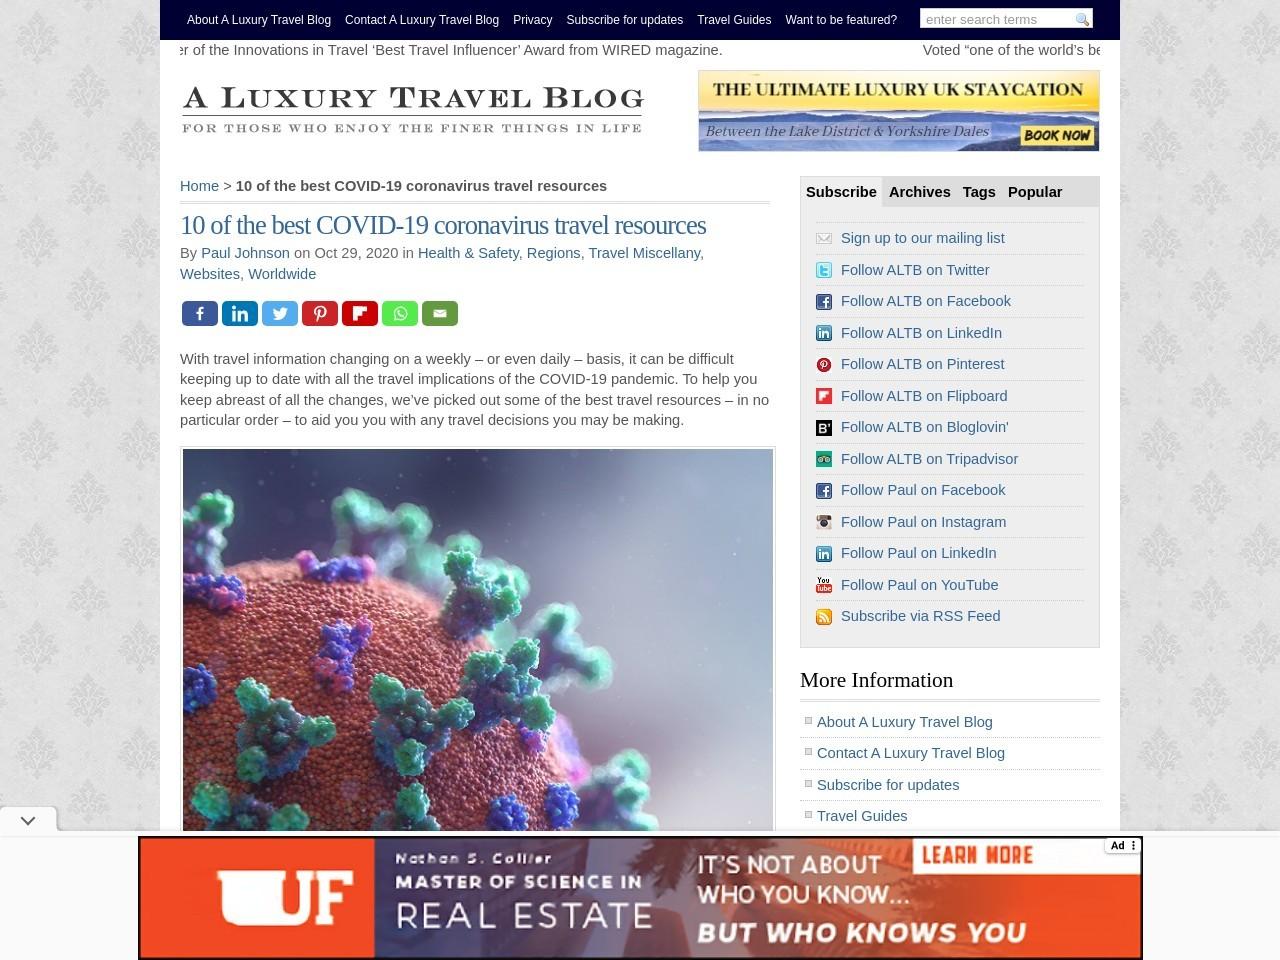 10 of the best COVID-19 coronavirus travel resources